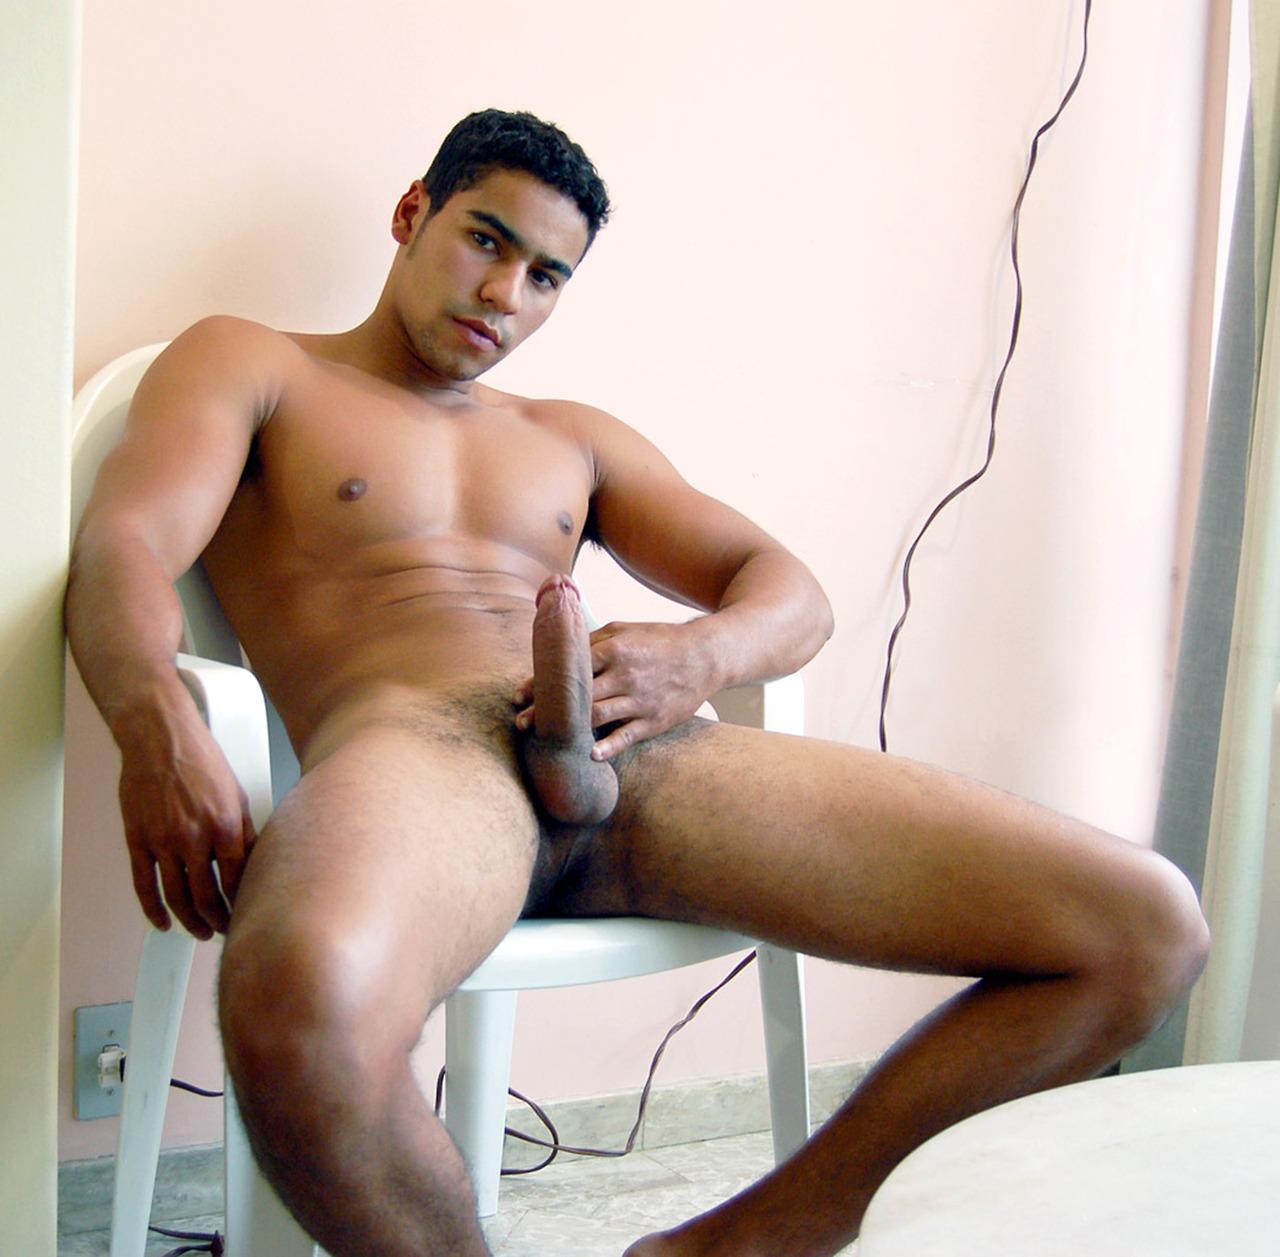 paternal age gay son homosexual